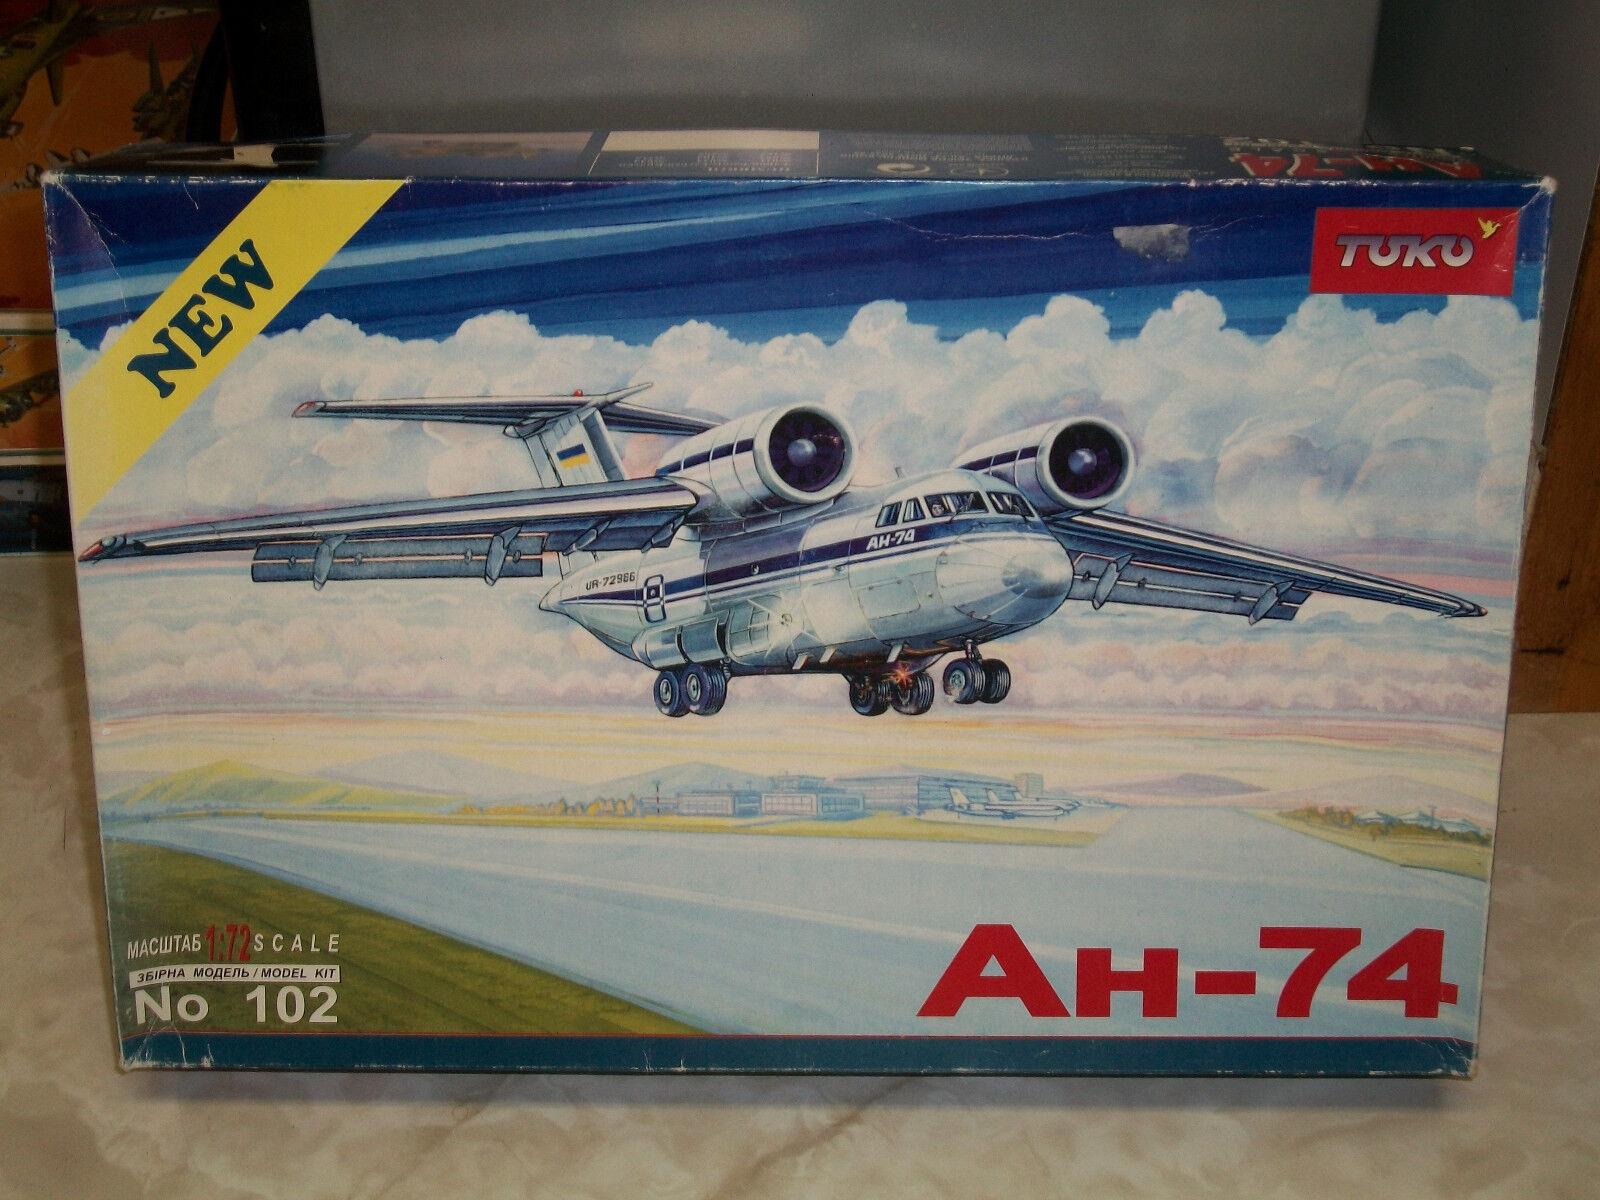 Toko 1 72 Scale Russian Antonov An-74